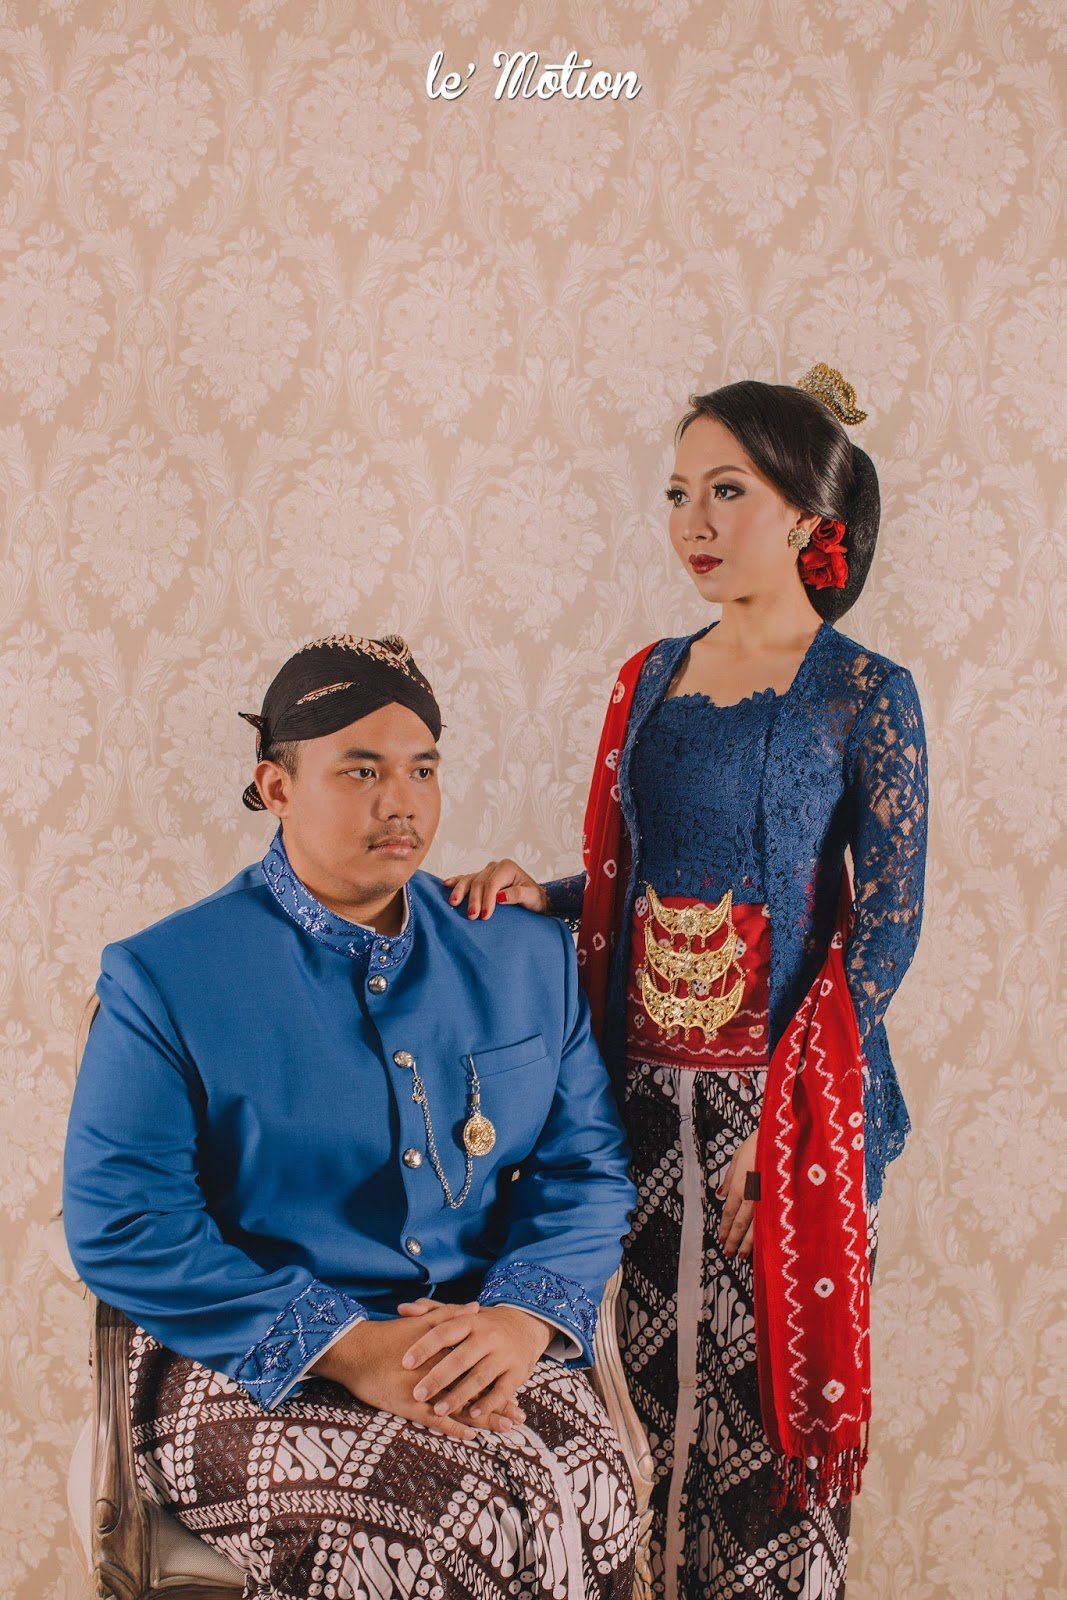 Le Motion Photo Wisnu Ayu Prewedding Adat Jawa Adat Sunda